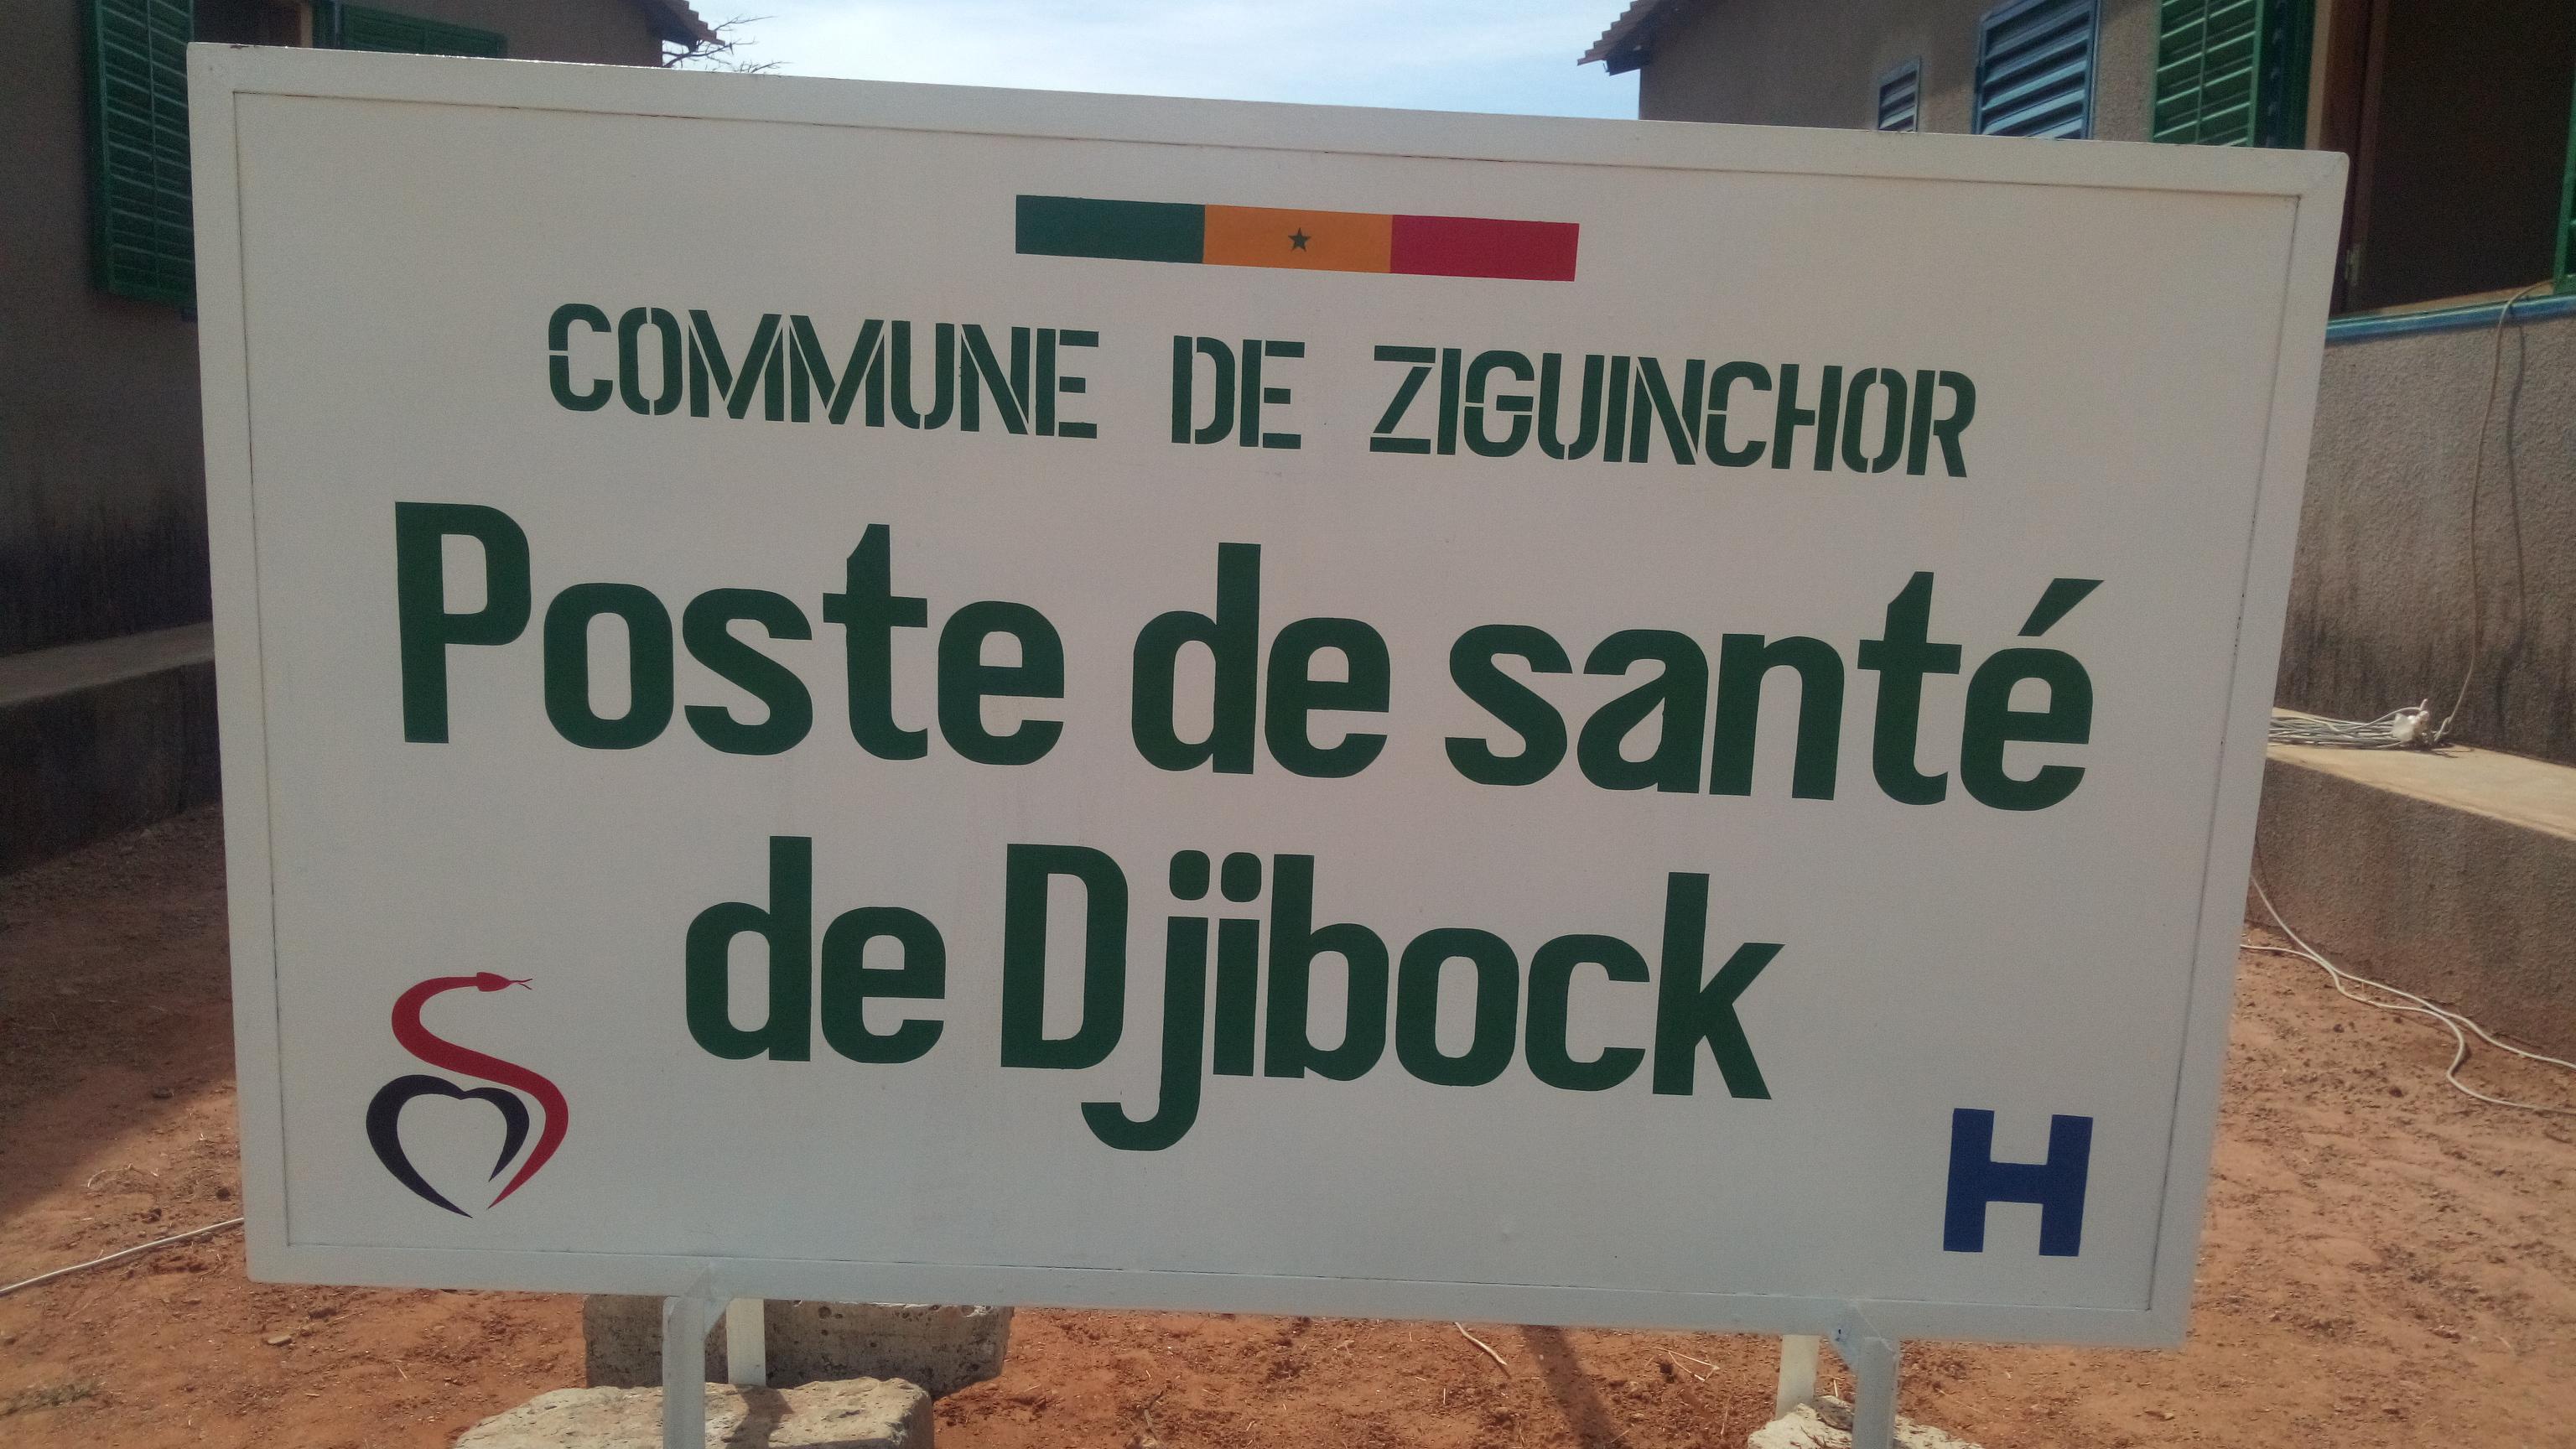 Ziguinchor: Djibock tient son poste de santé (Photos)